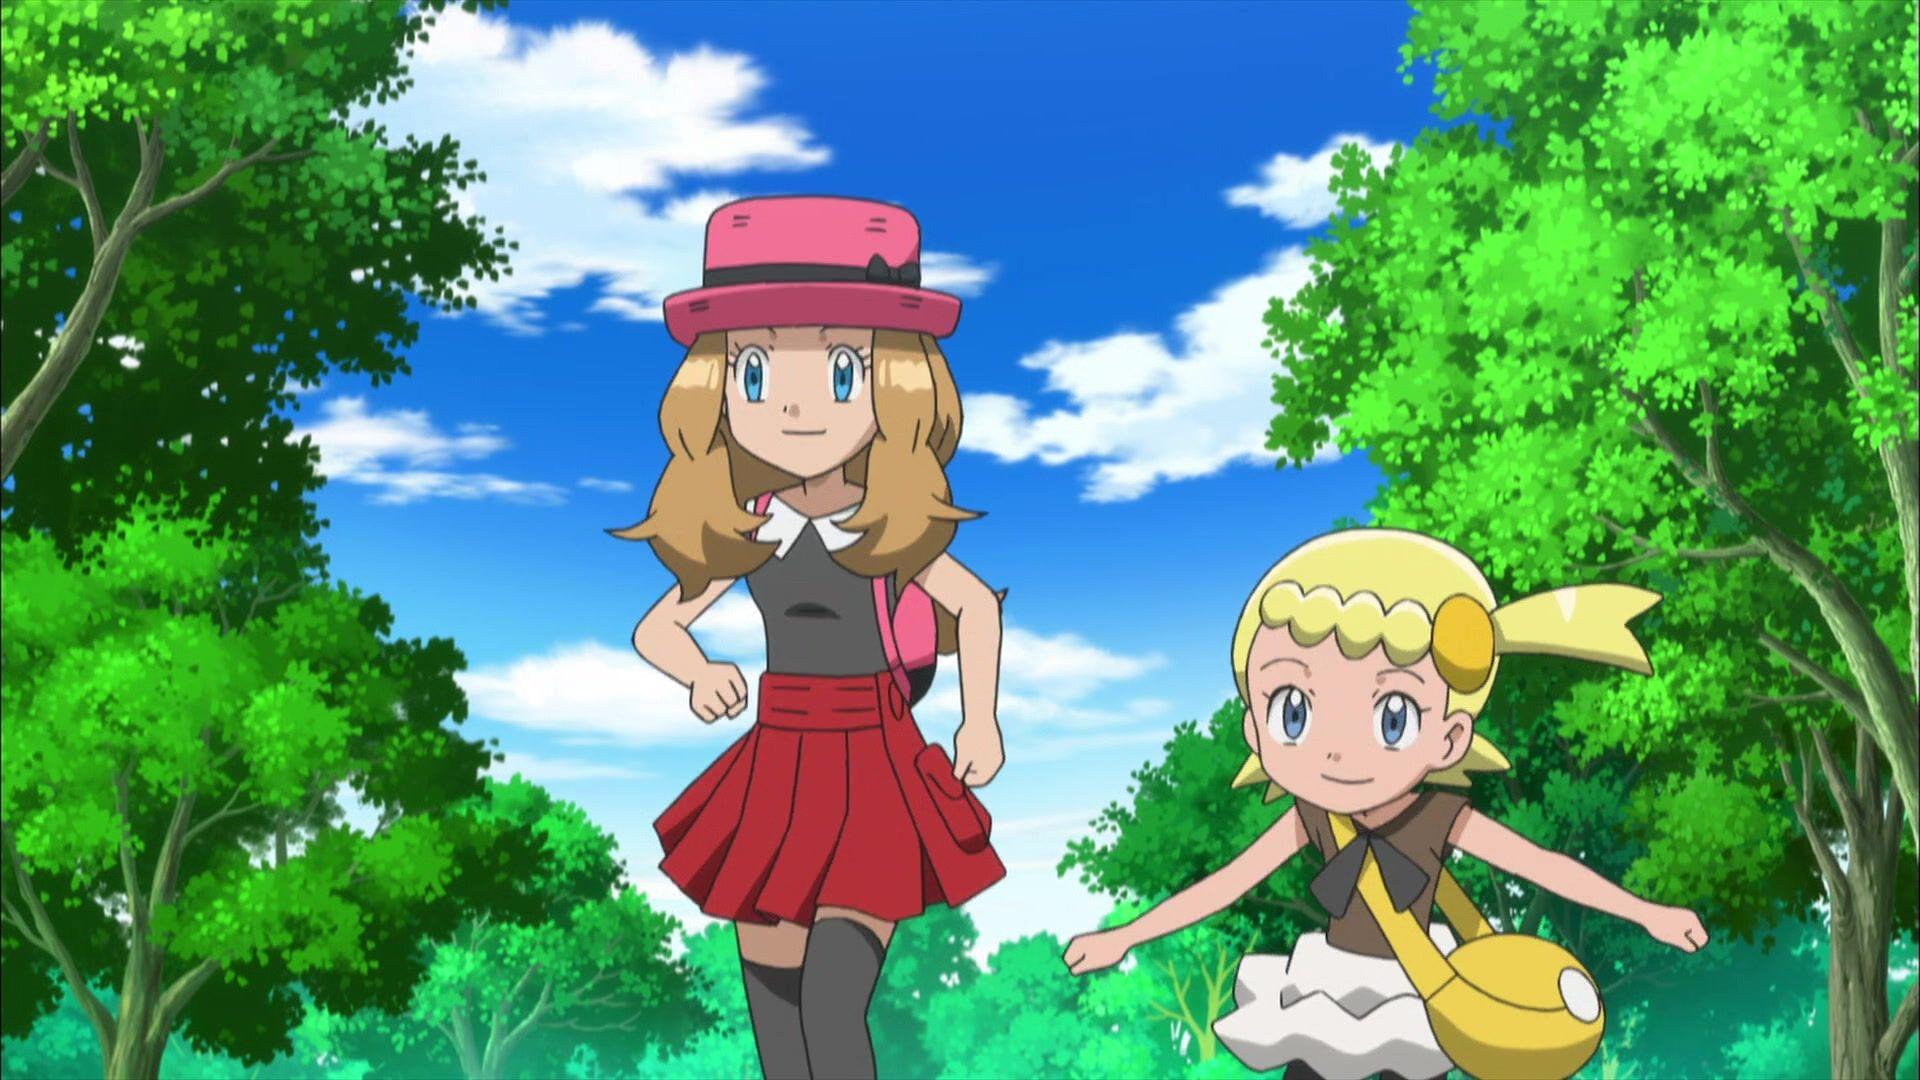 Anime Screencap And Image For Pokemon Xy  Fancapsnet -7879